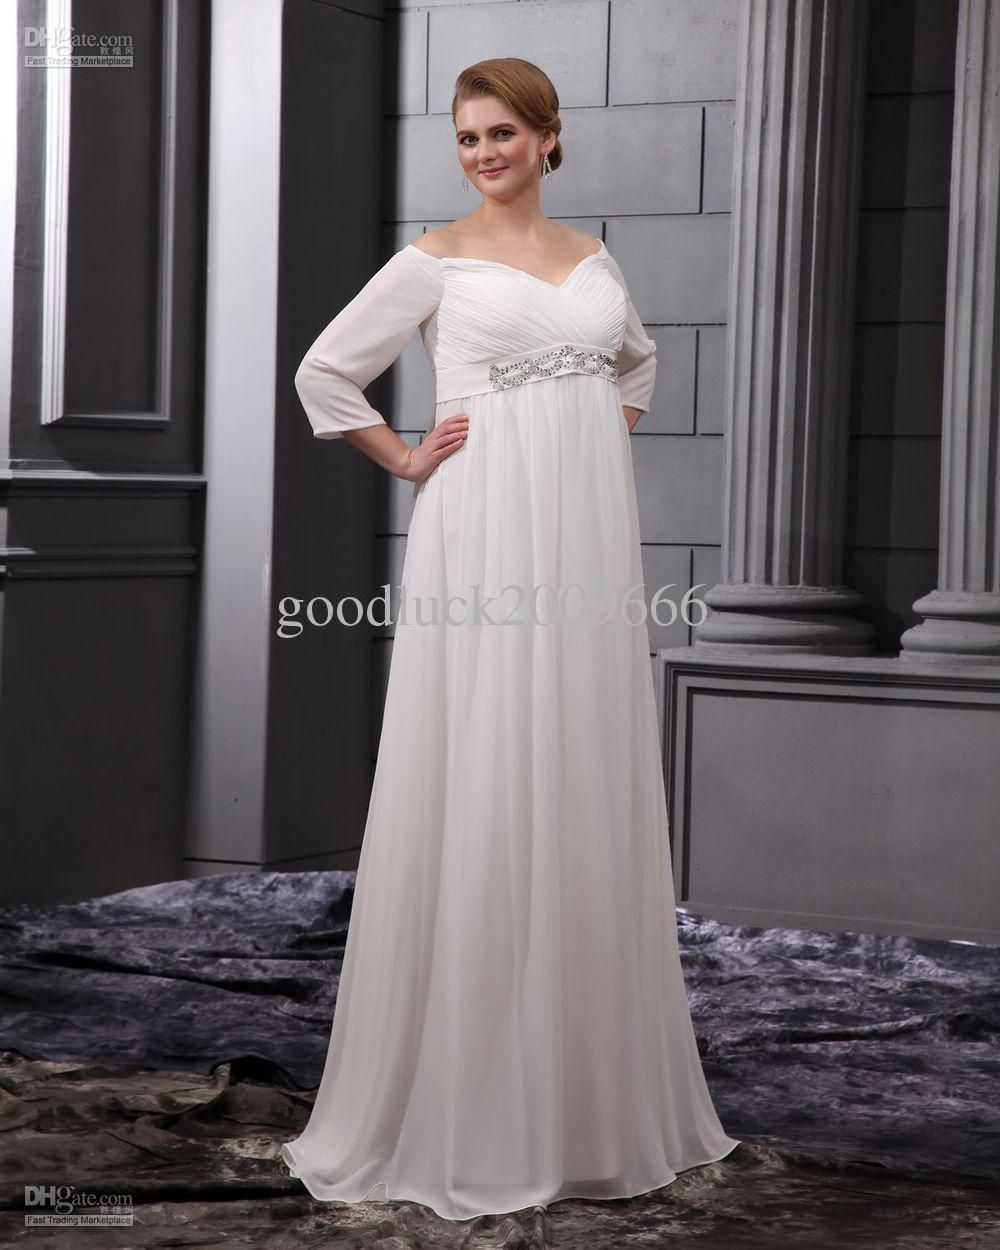 Wholesale wedding dresses long sleeves chiffon beads v neck